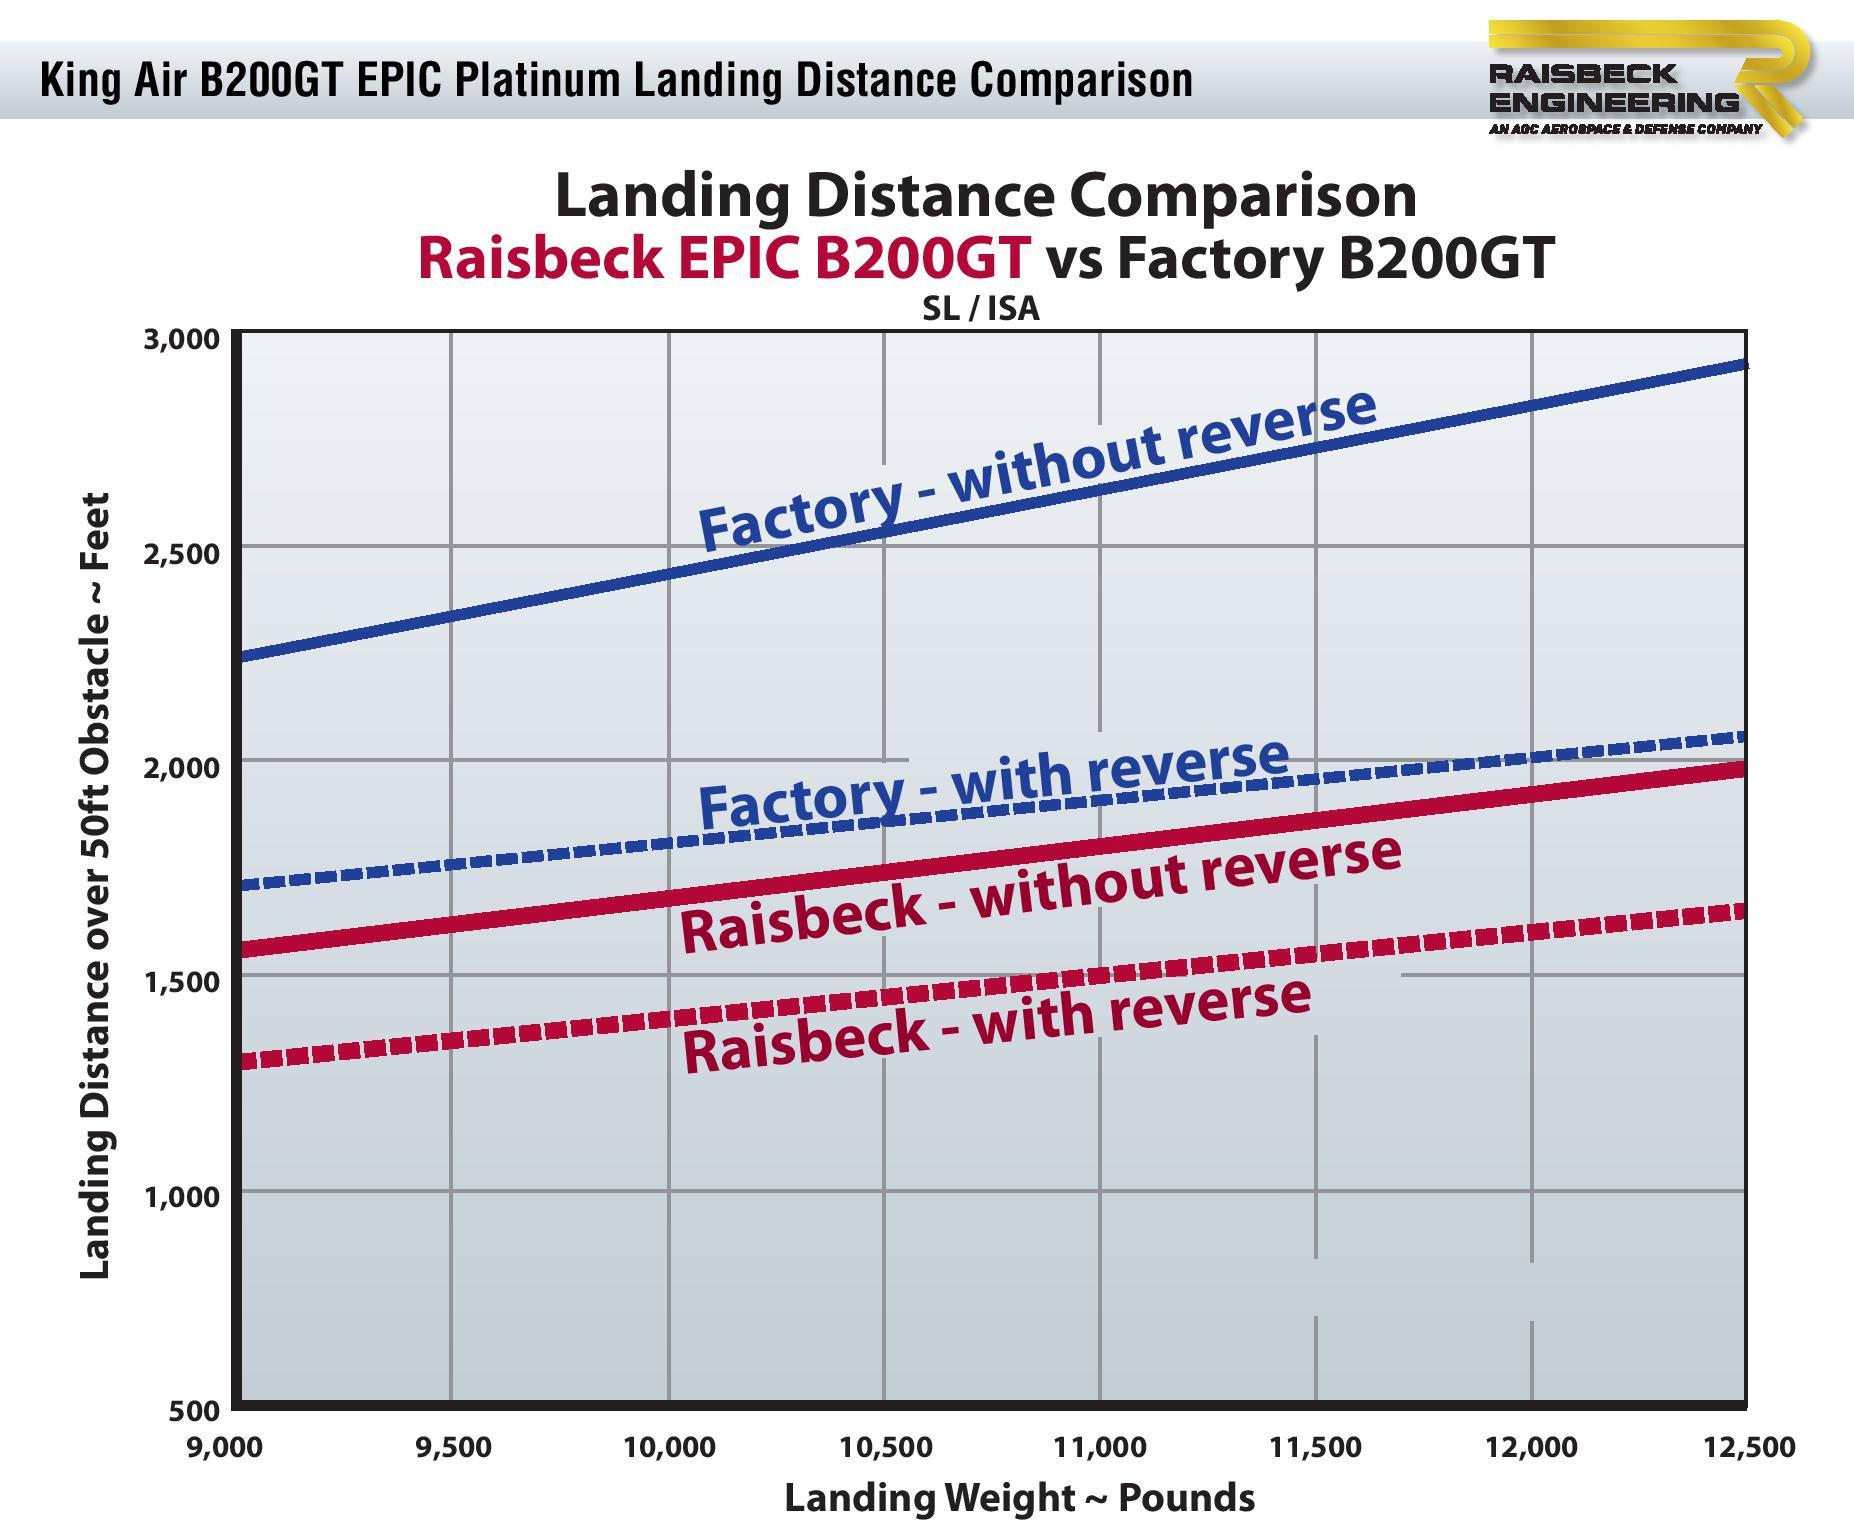 B200GT EPIC Platinum Landing Distance Chart